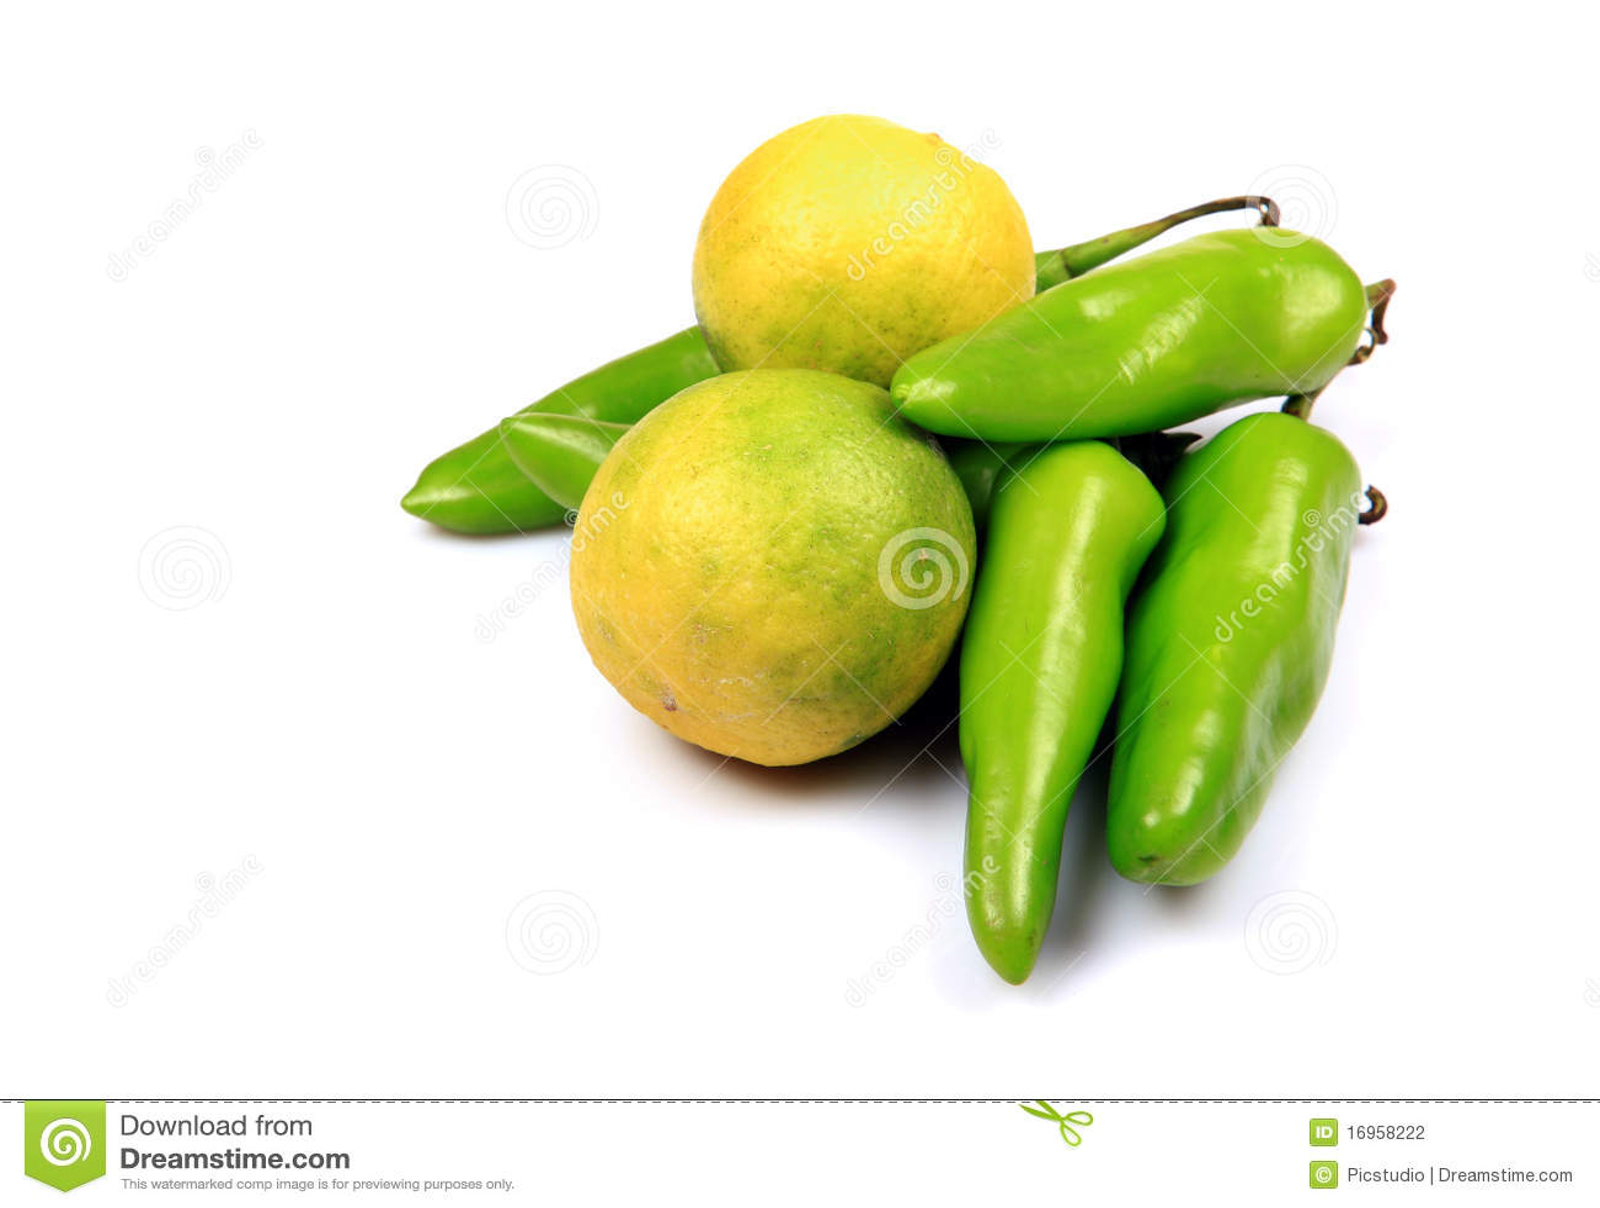 Green chillies and lemon